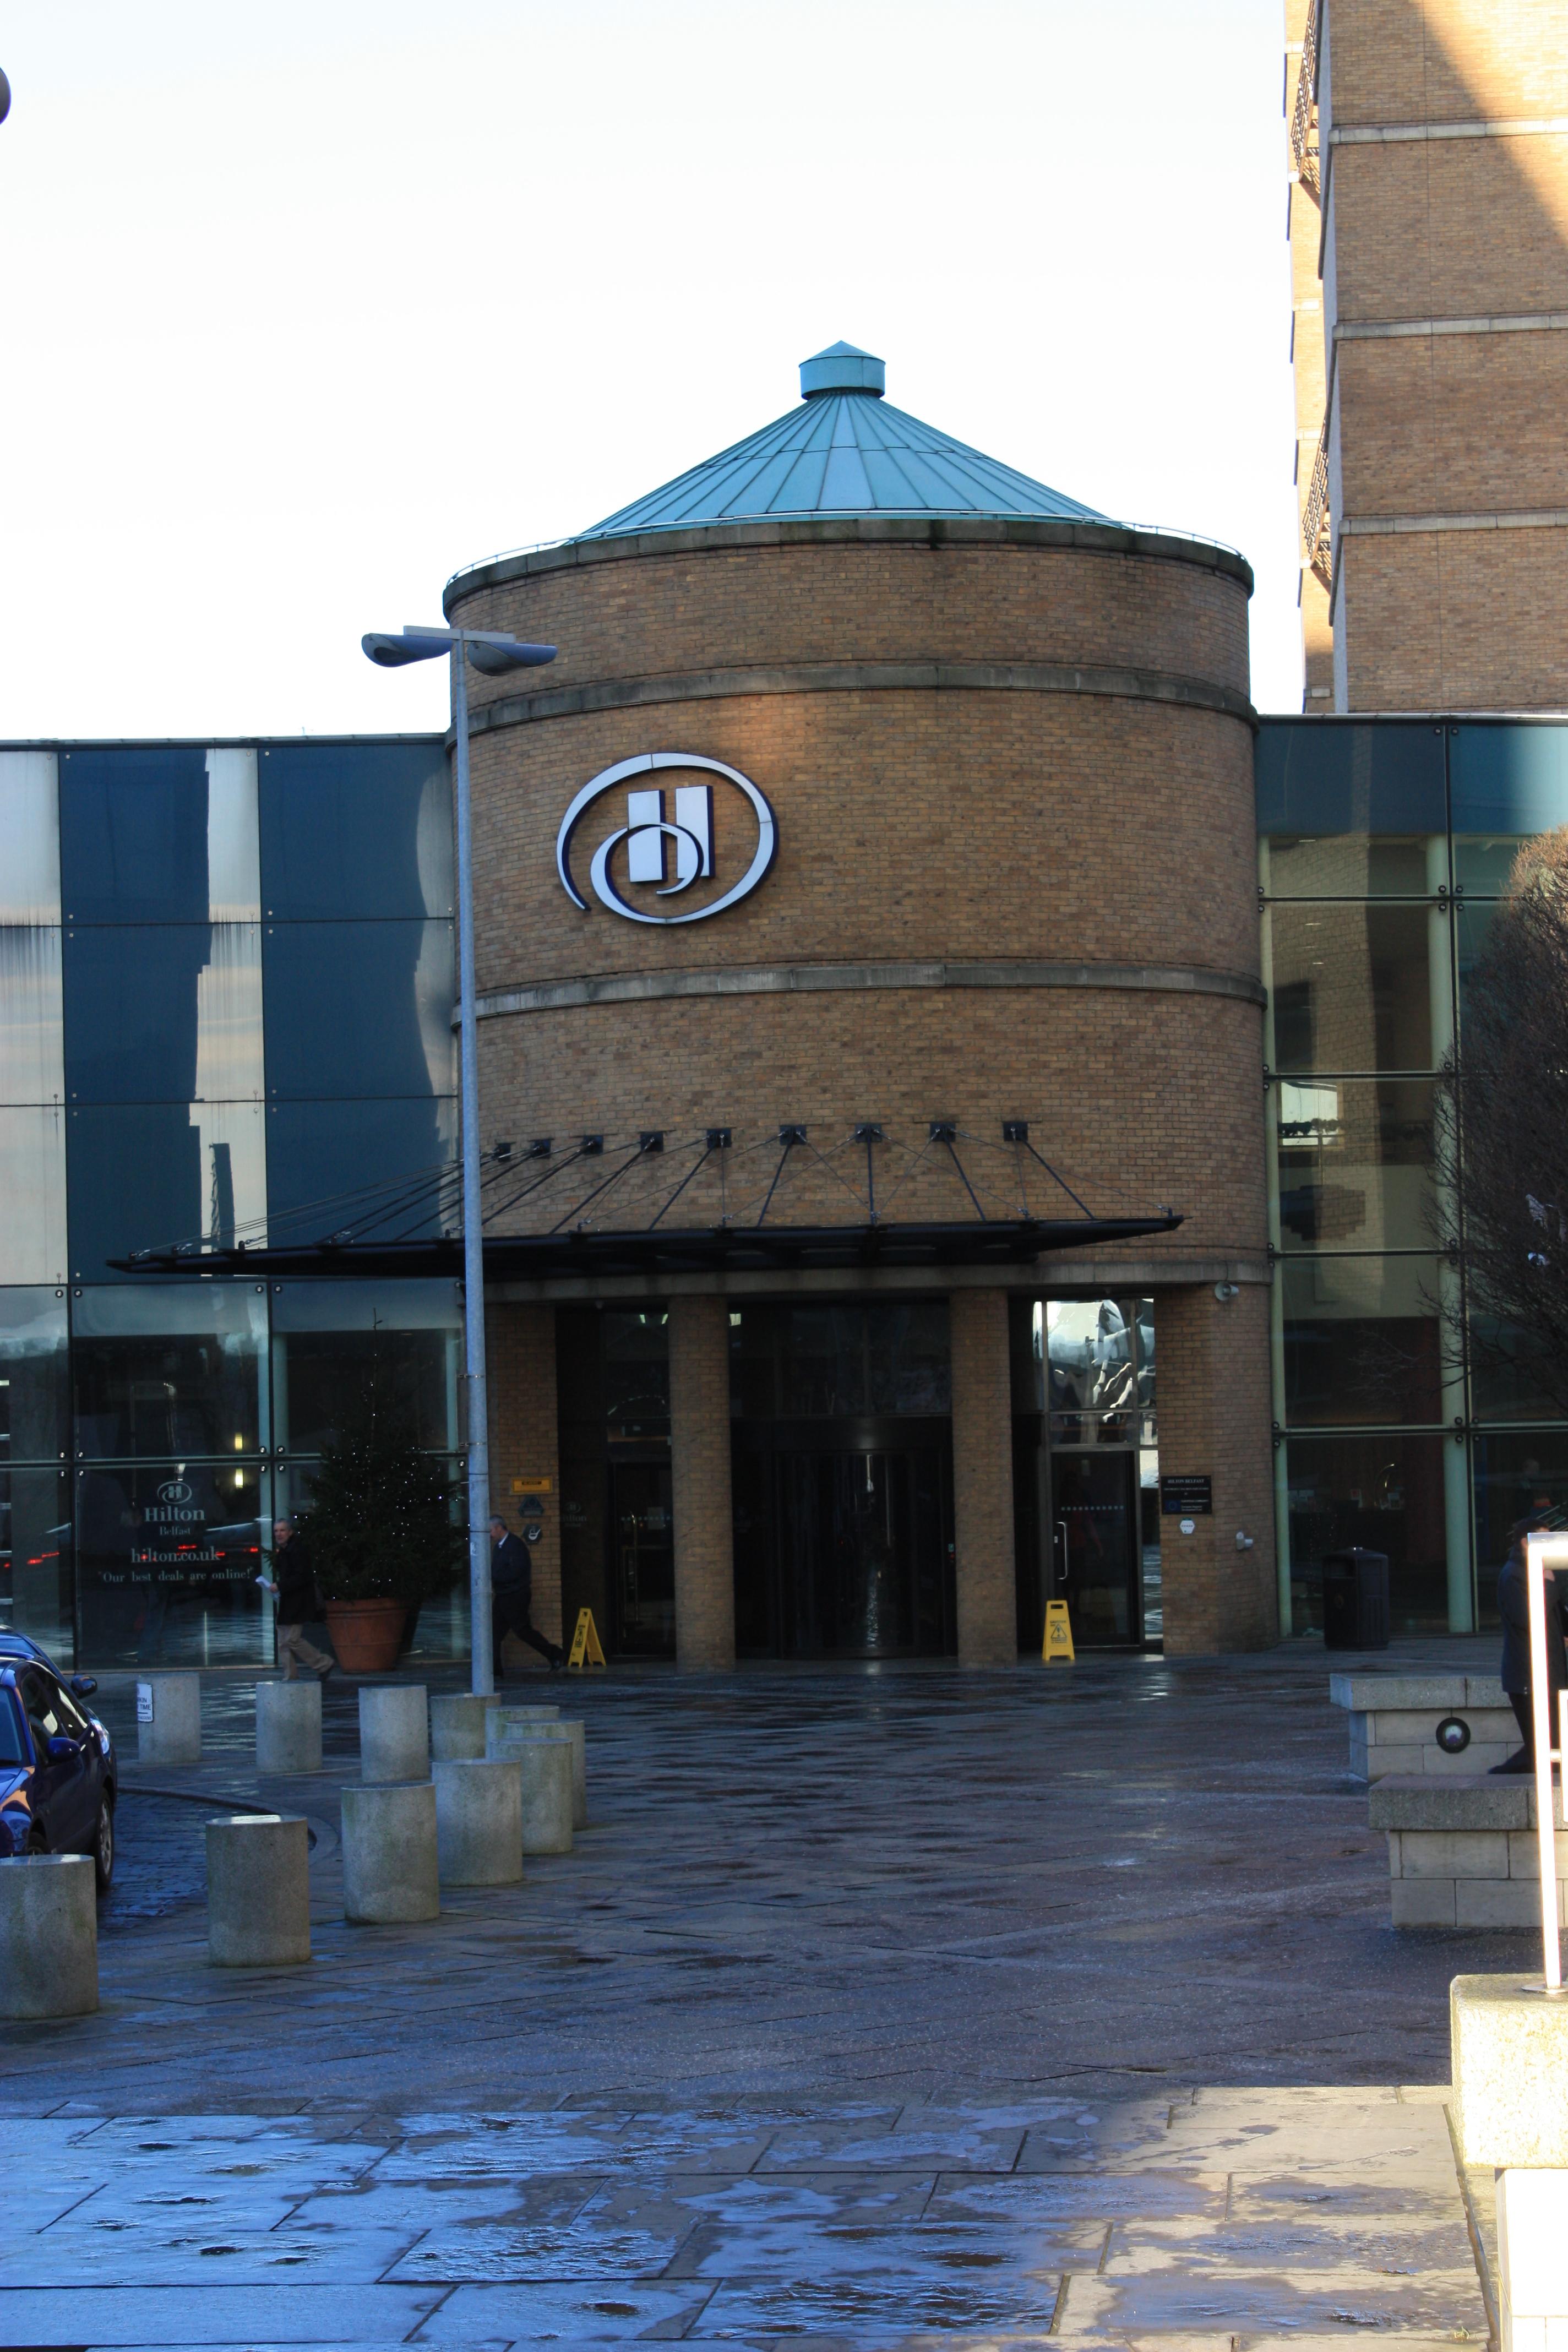 Hilton Hotel Belfast Ireland